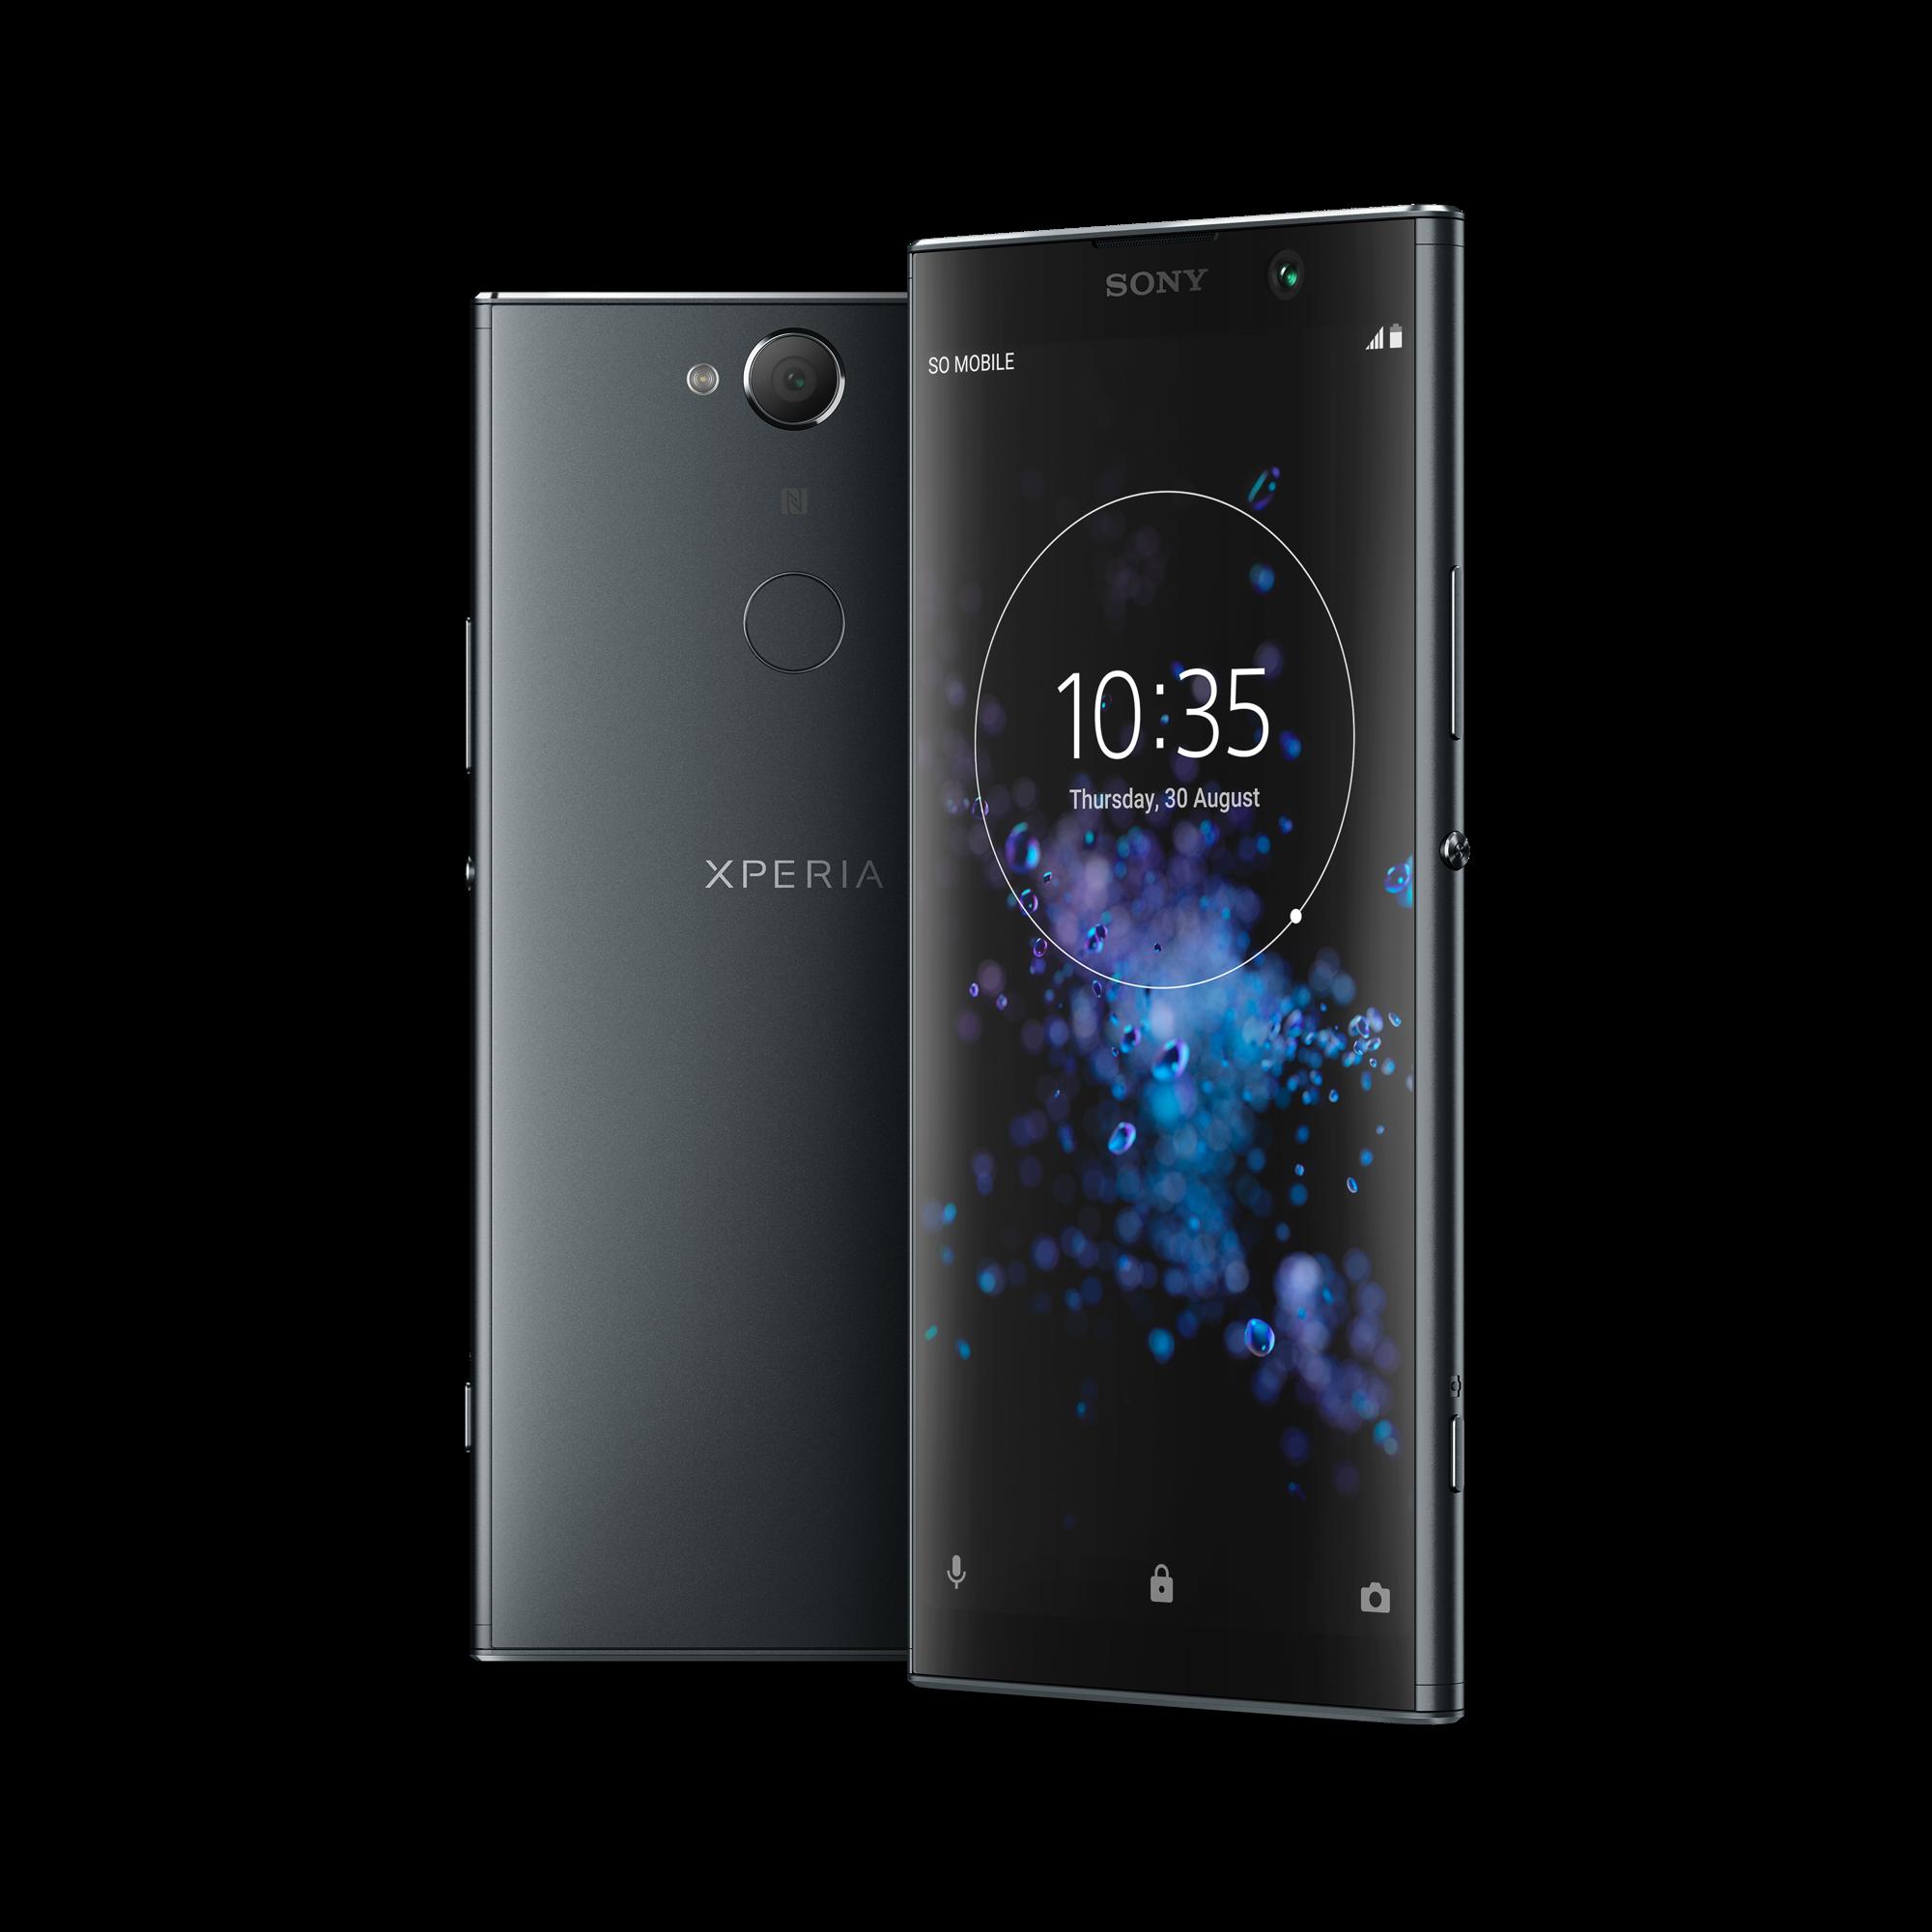 Sony Mobile、Xperia XA2 Plusを発表。Snapdragon 630搭載